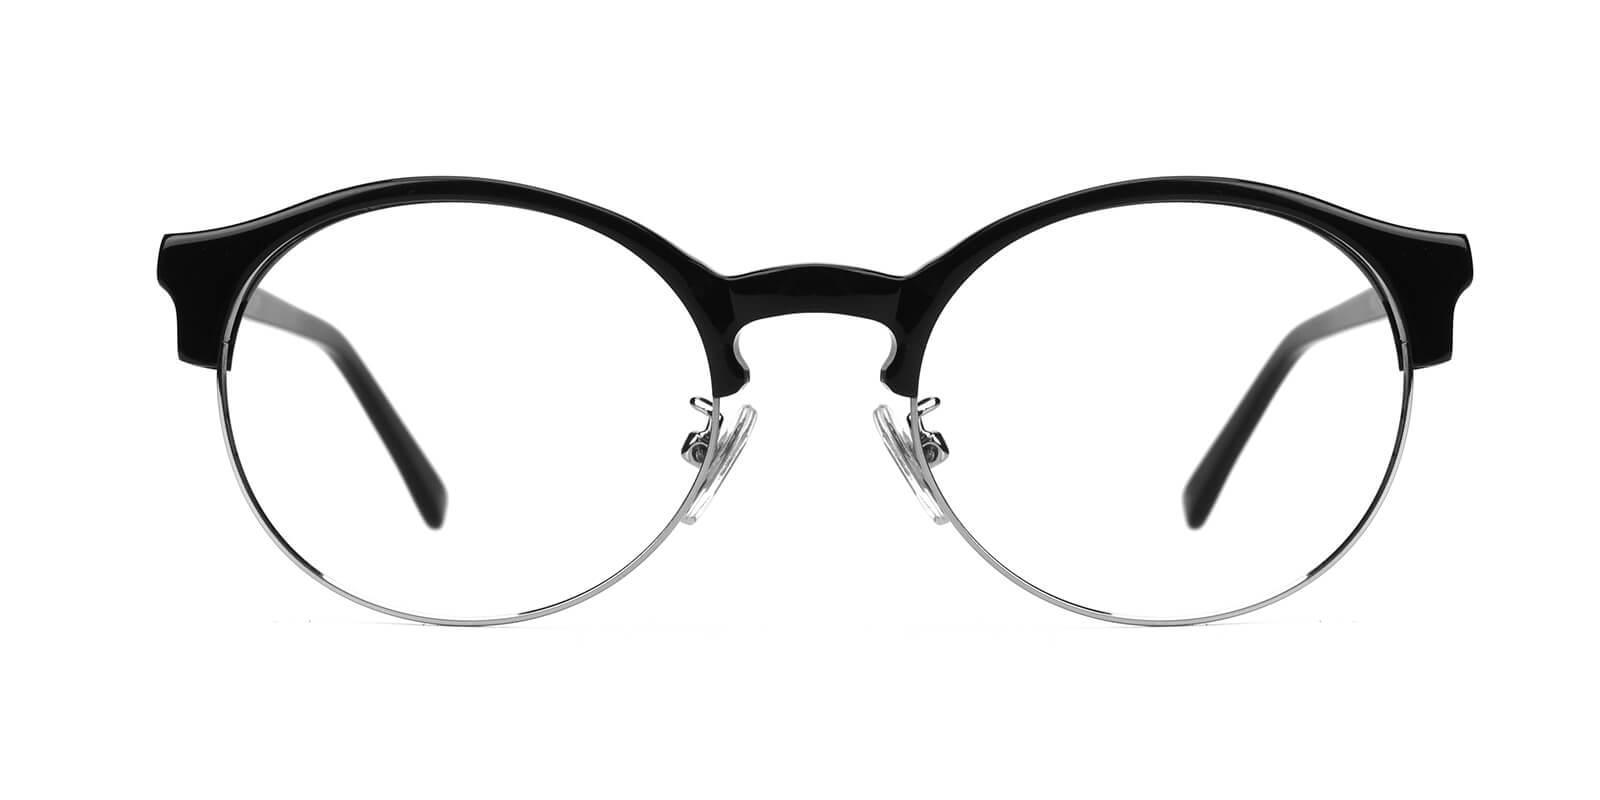 Zenoria-Black-Browline-Combination-Eyeglasses-additional2